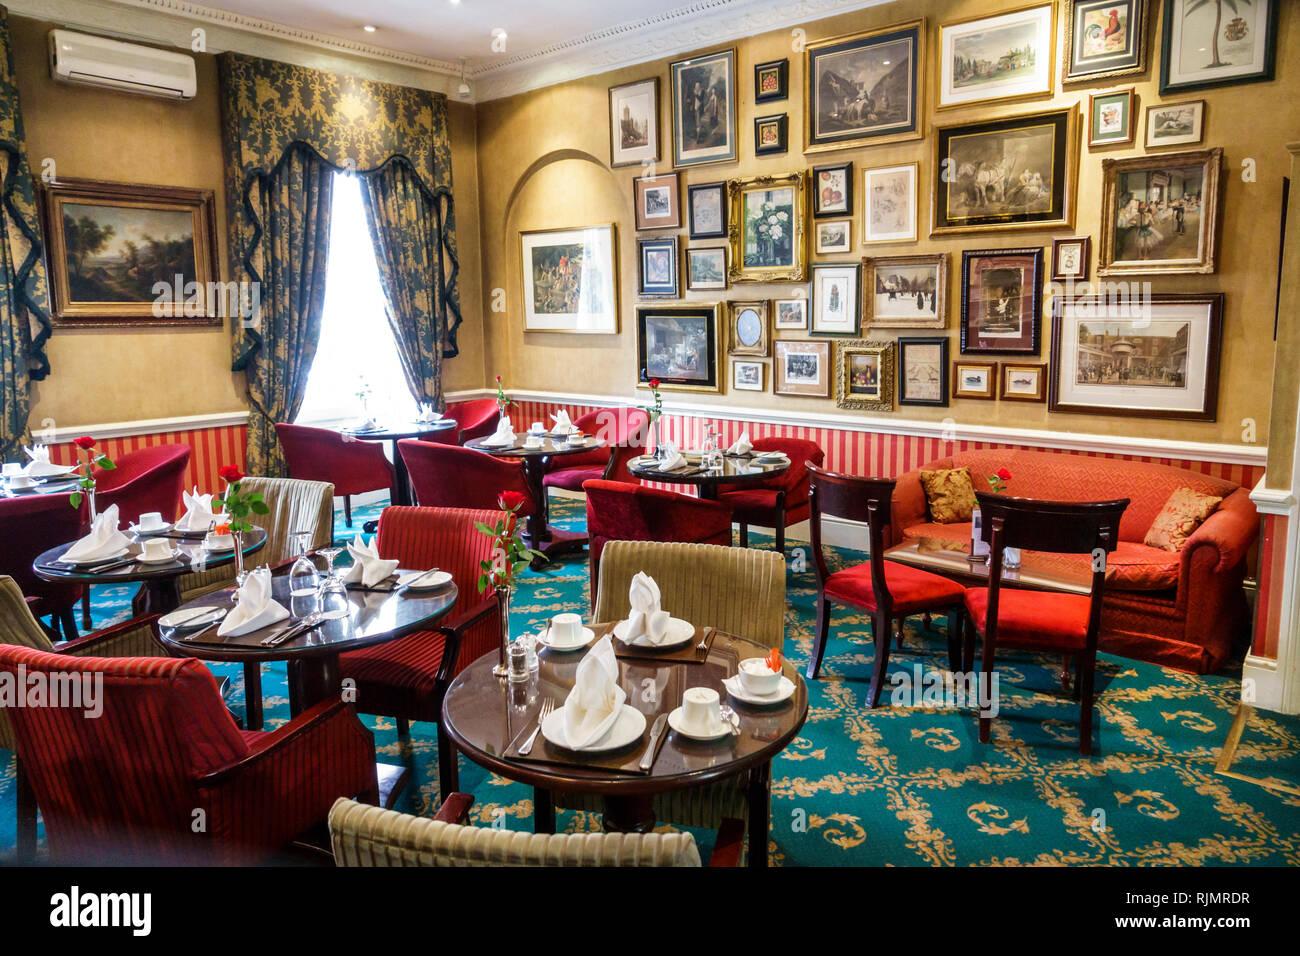 United Kingdom Great Britain England London Marylebone Marble Arch Leonard Hotel boutique hotel lobby tea room traditional decor plush nostalgic - Stock Image